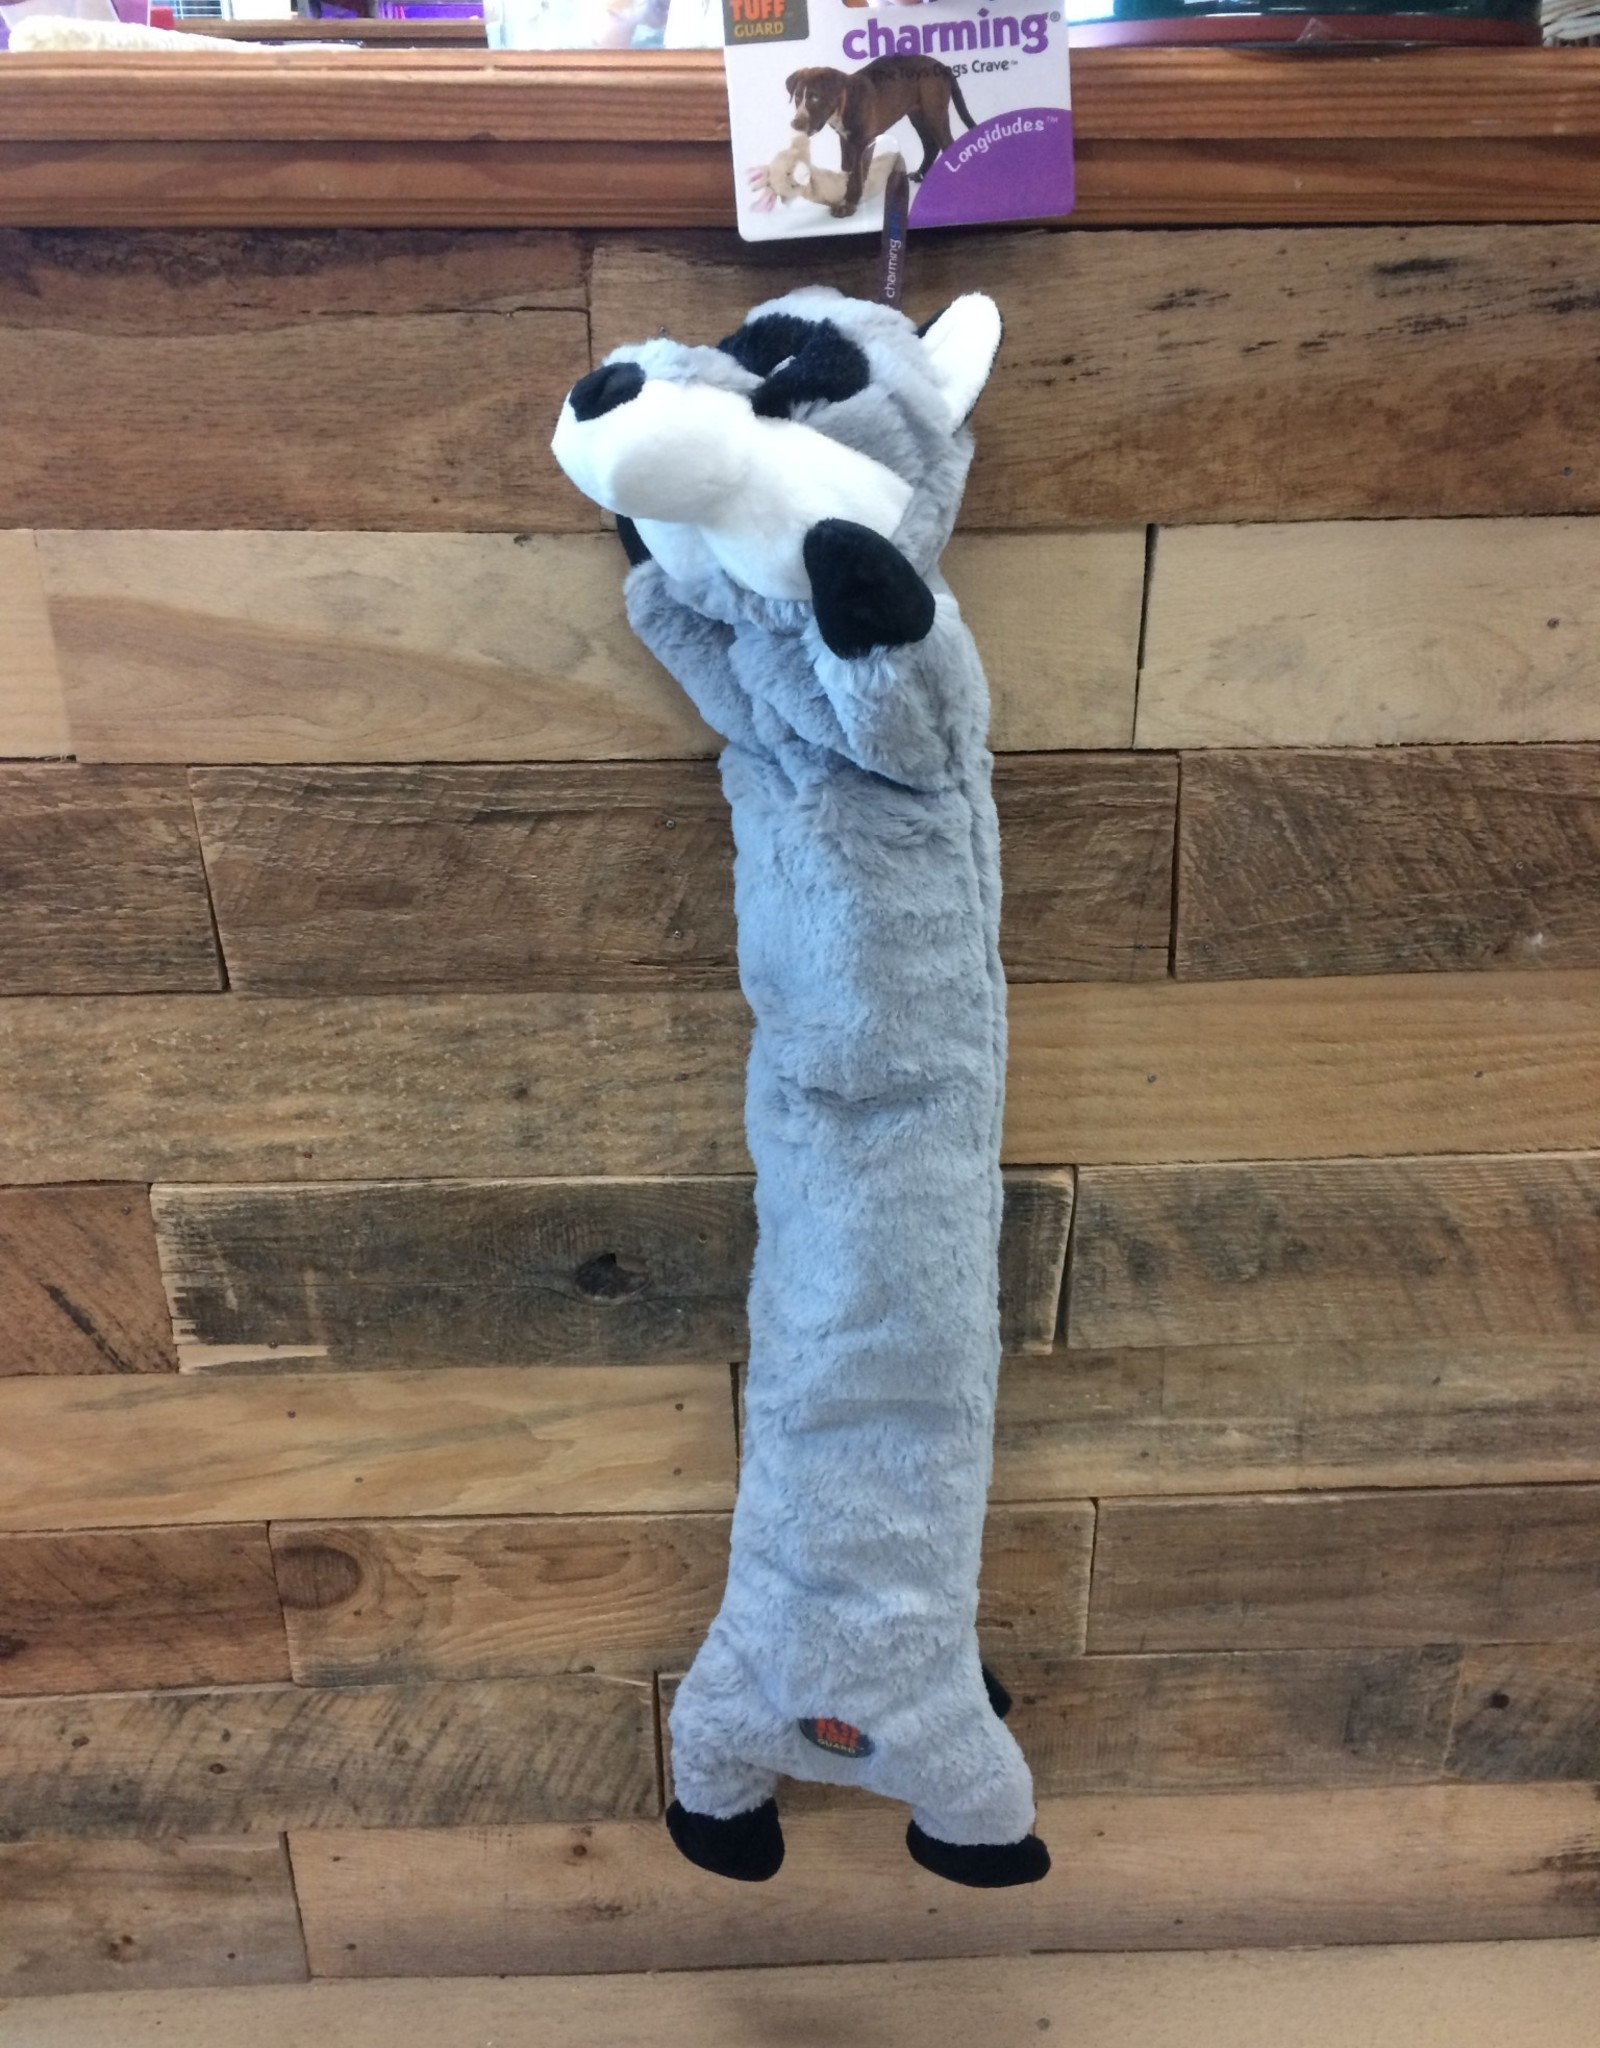 Outward Hound - Charming Pet Charming pet LONGIDUDES RACCOON